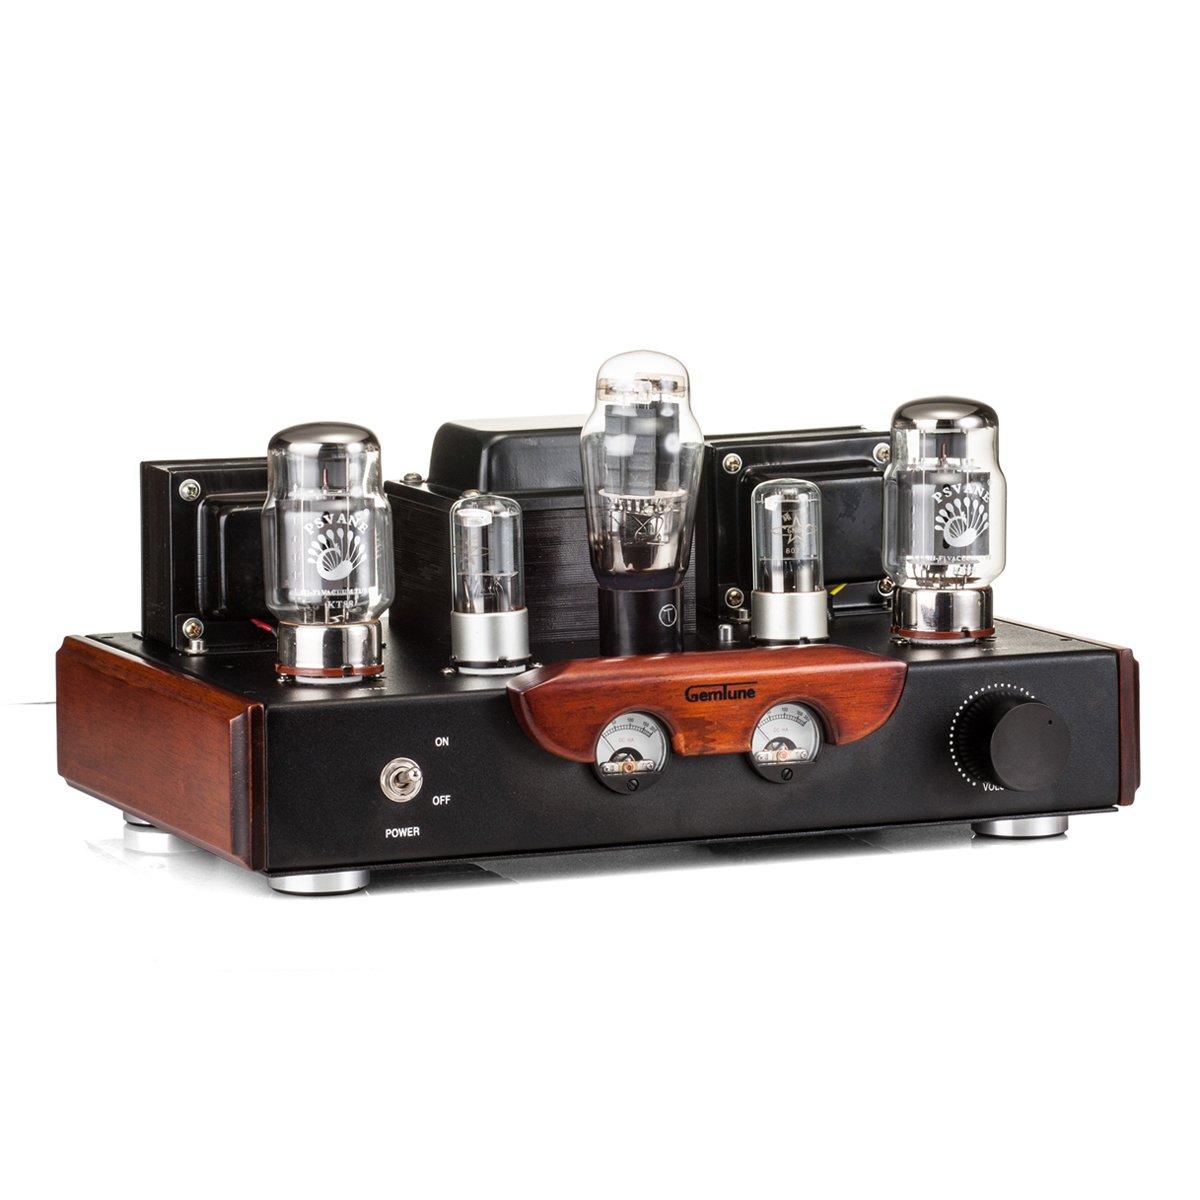 GemTune GS-02 KT88 Hi-Fi Tube Amplifier, Tubes:KT88*2, 6N8P*2, 5Z3P*1,  Hi-end Tube Amplifier, Single-end, Integrated Amplifier, 100% Handmade